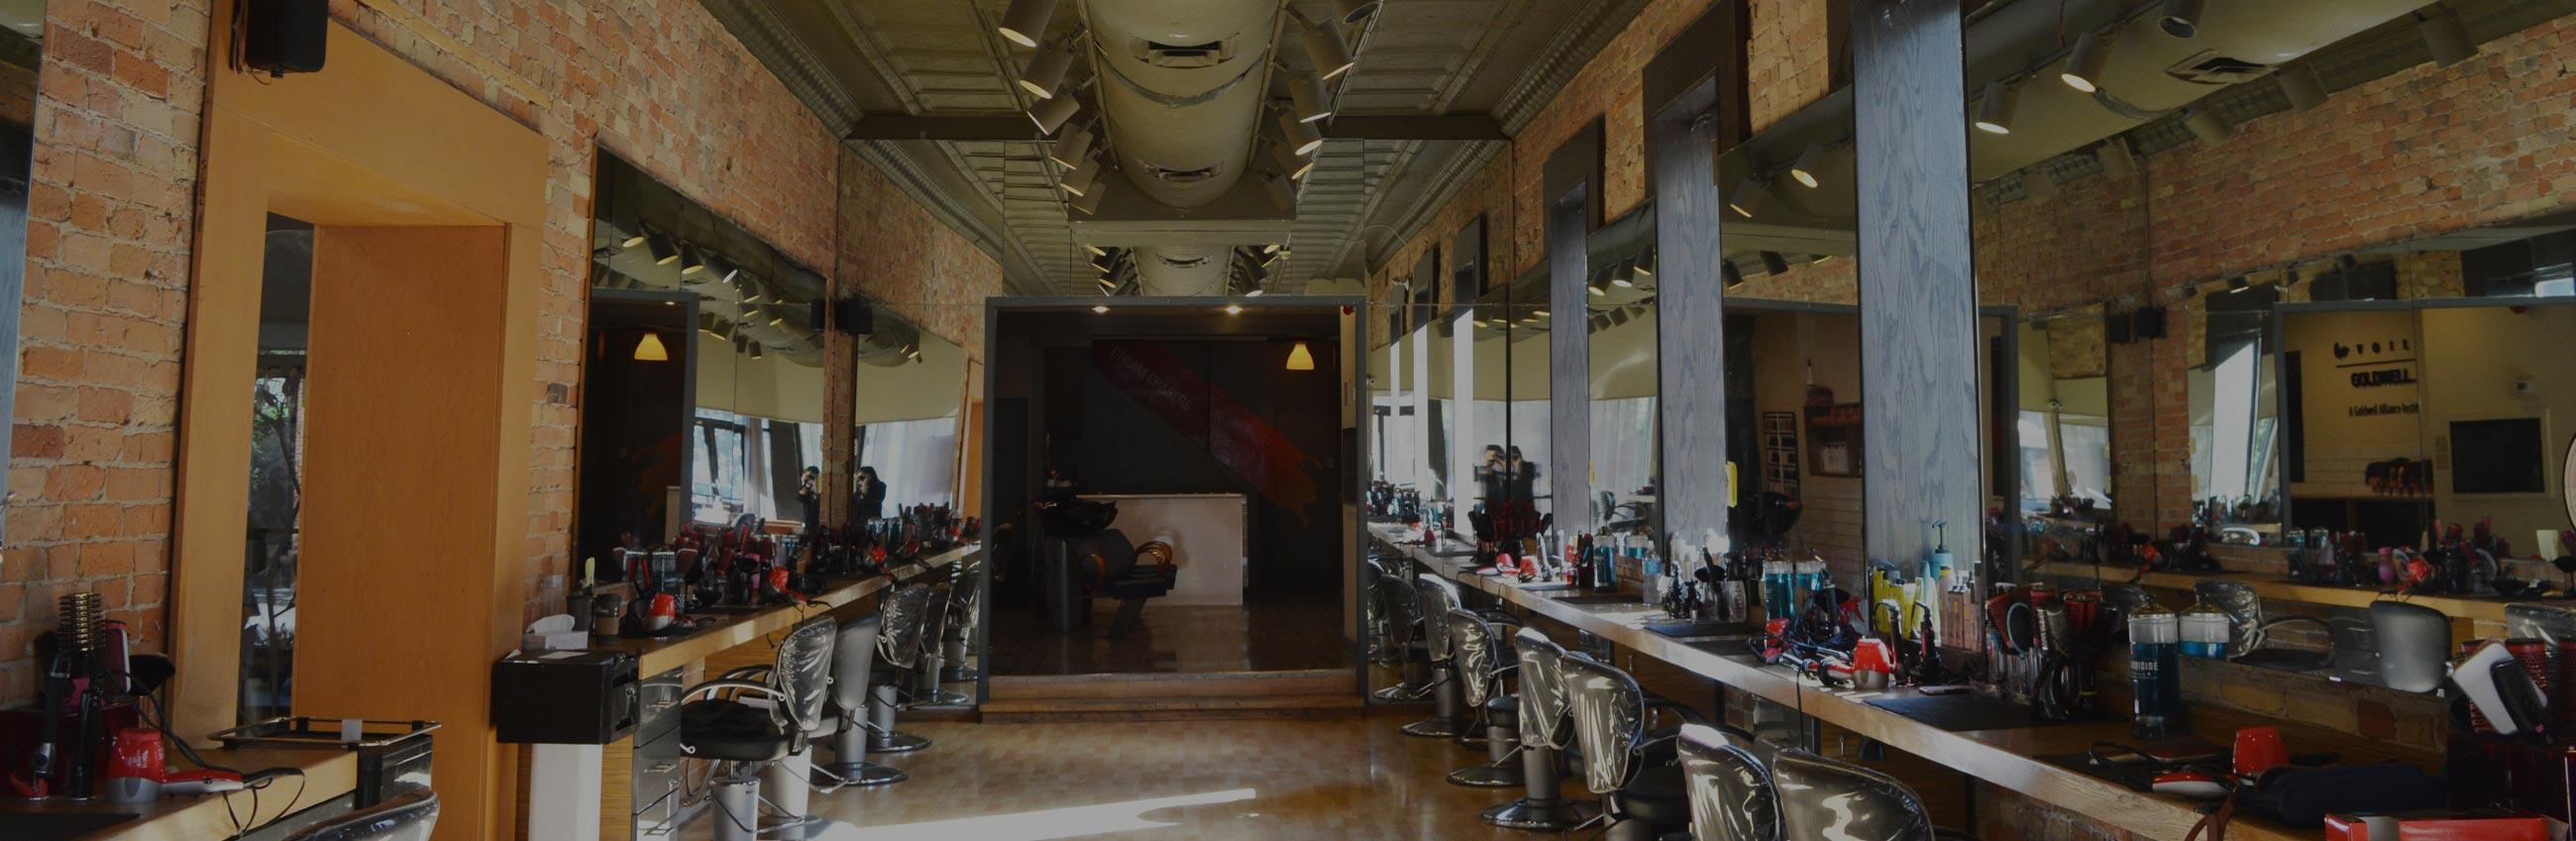 Hair salon spa locations voila the best hair salon - Voila institute of hair design kitchener ...